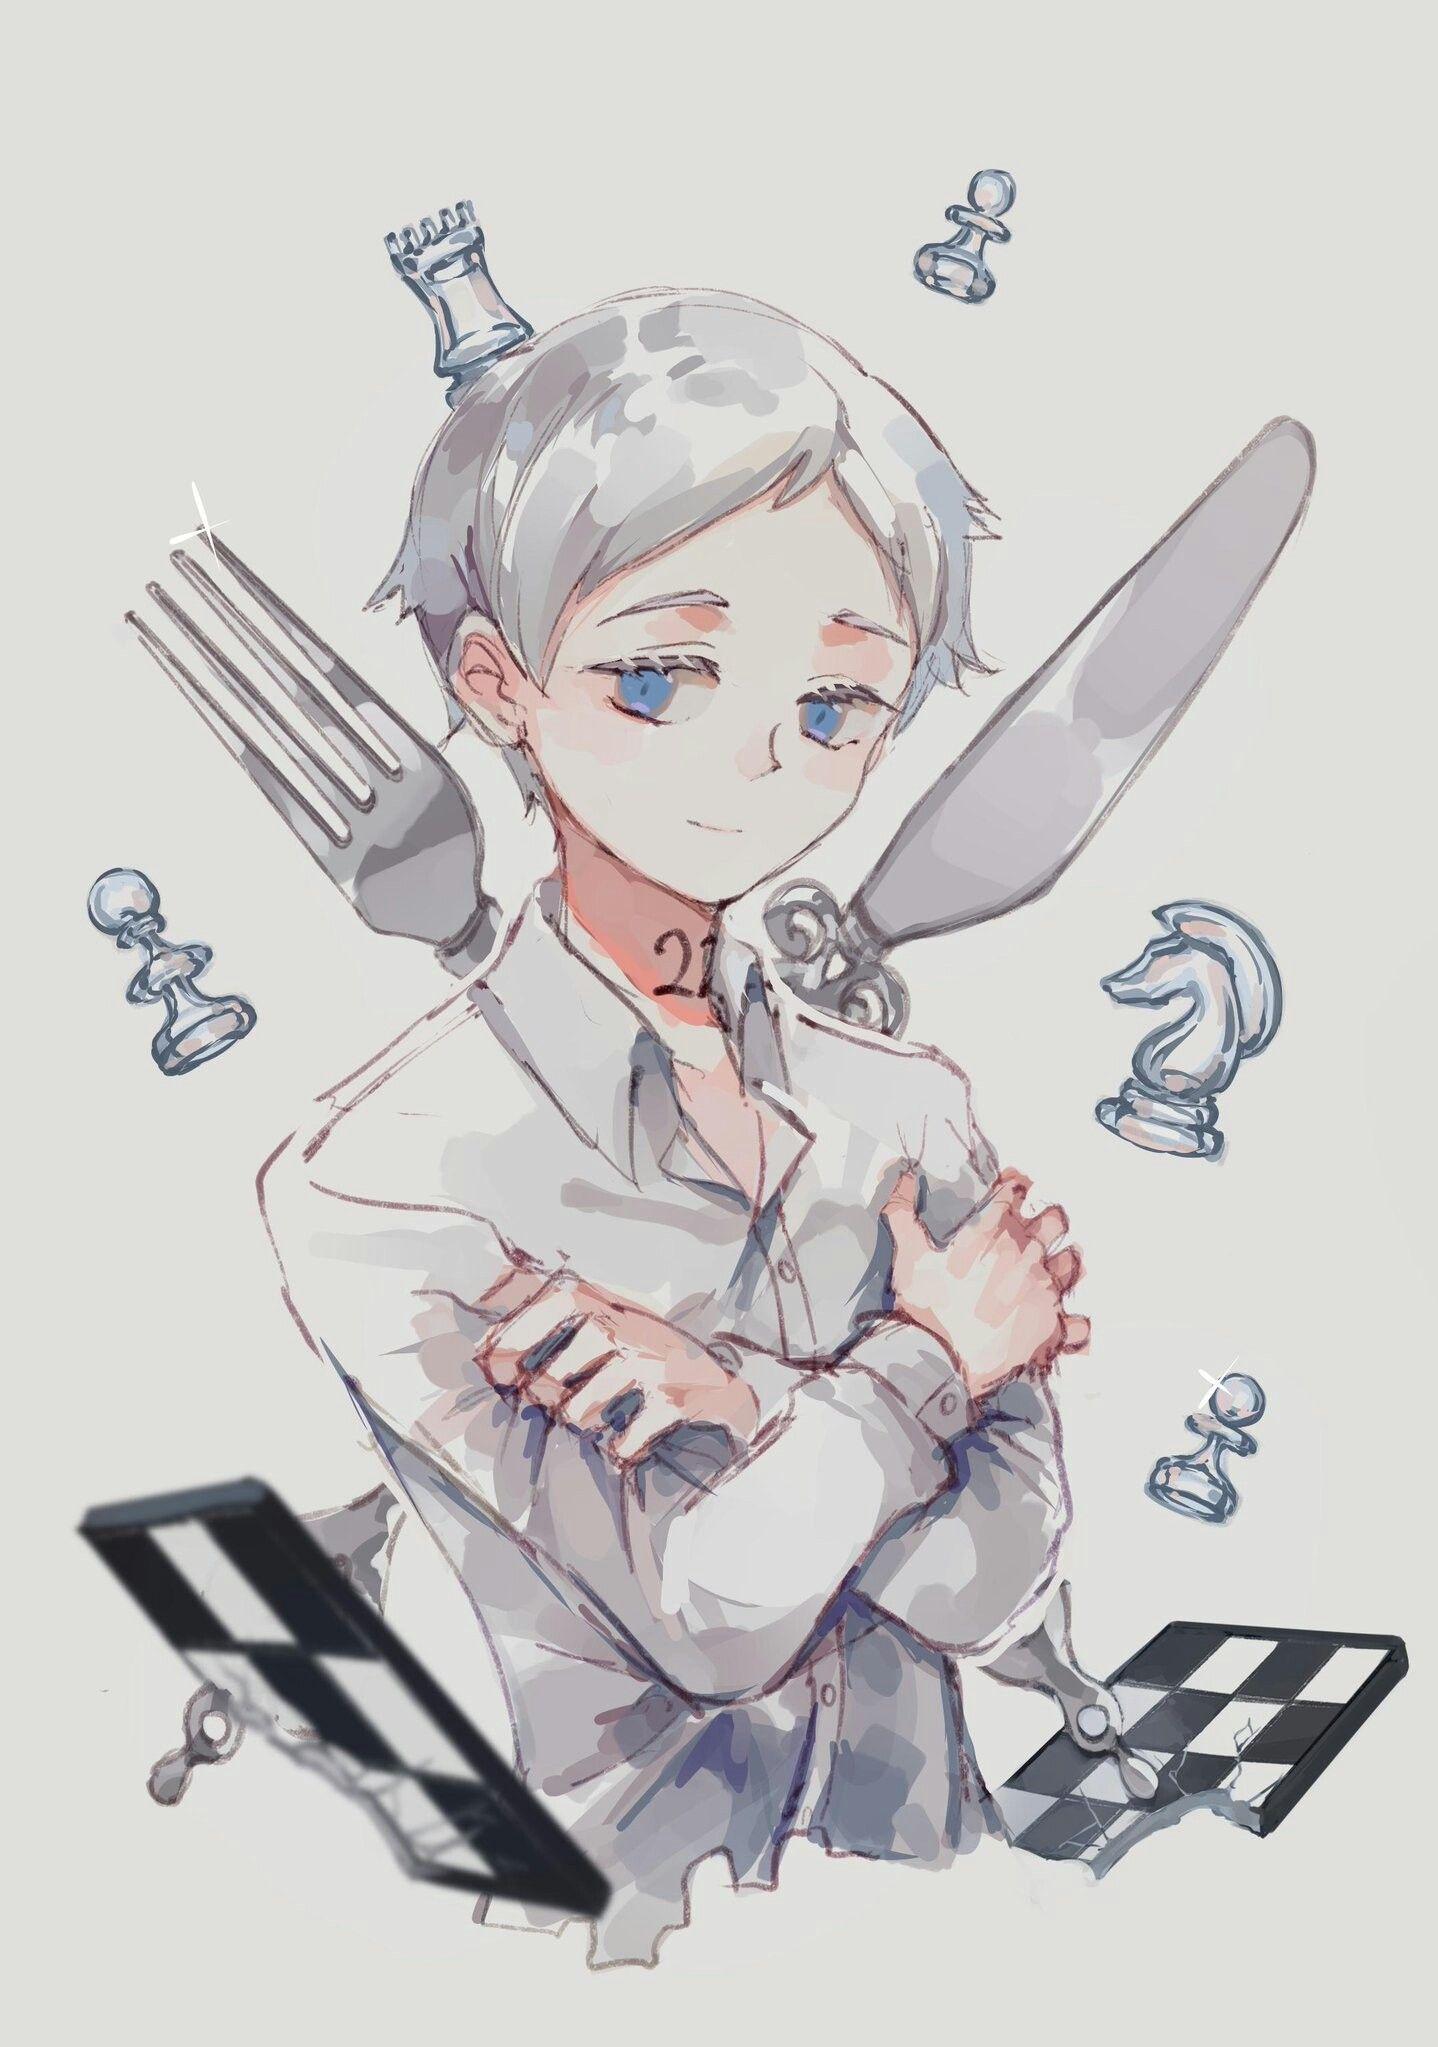 Norman The Promised Neverland Anime, Neverland art